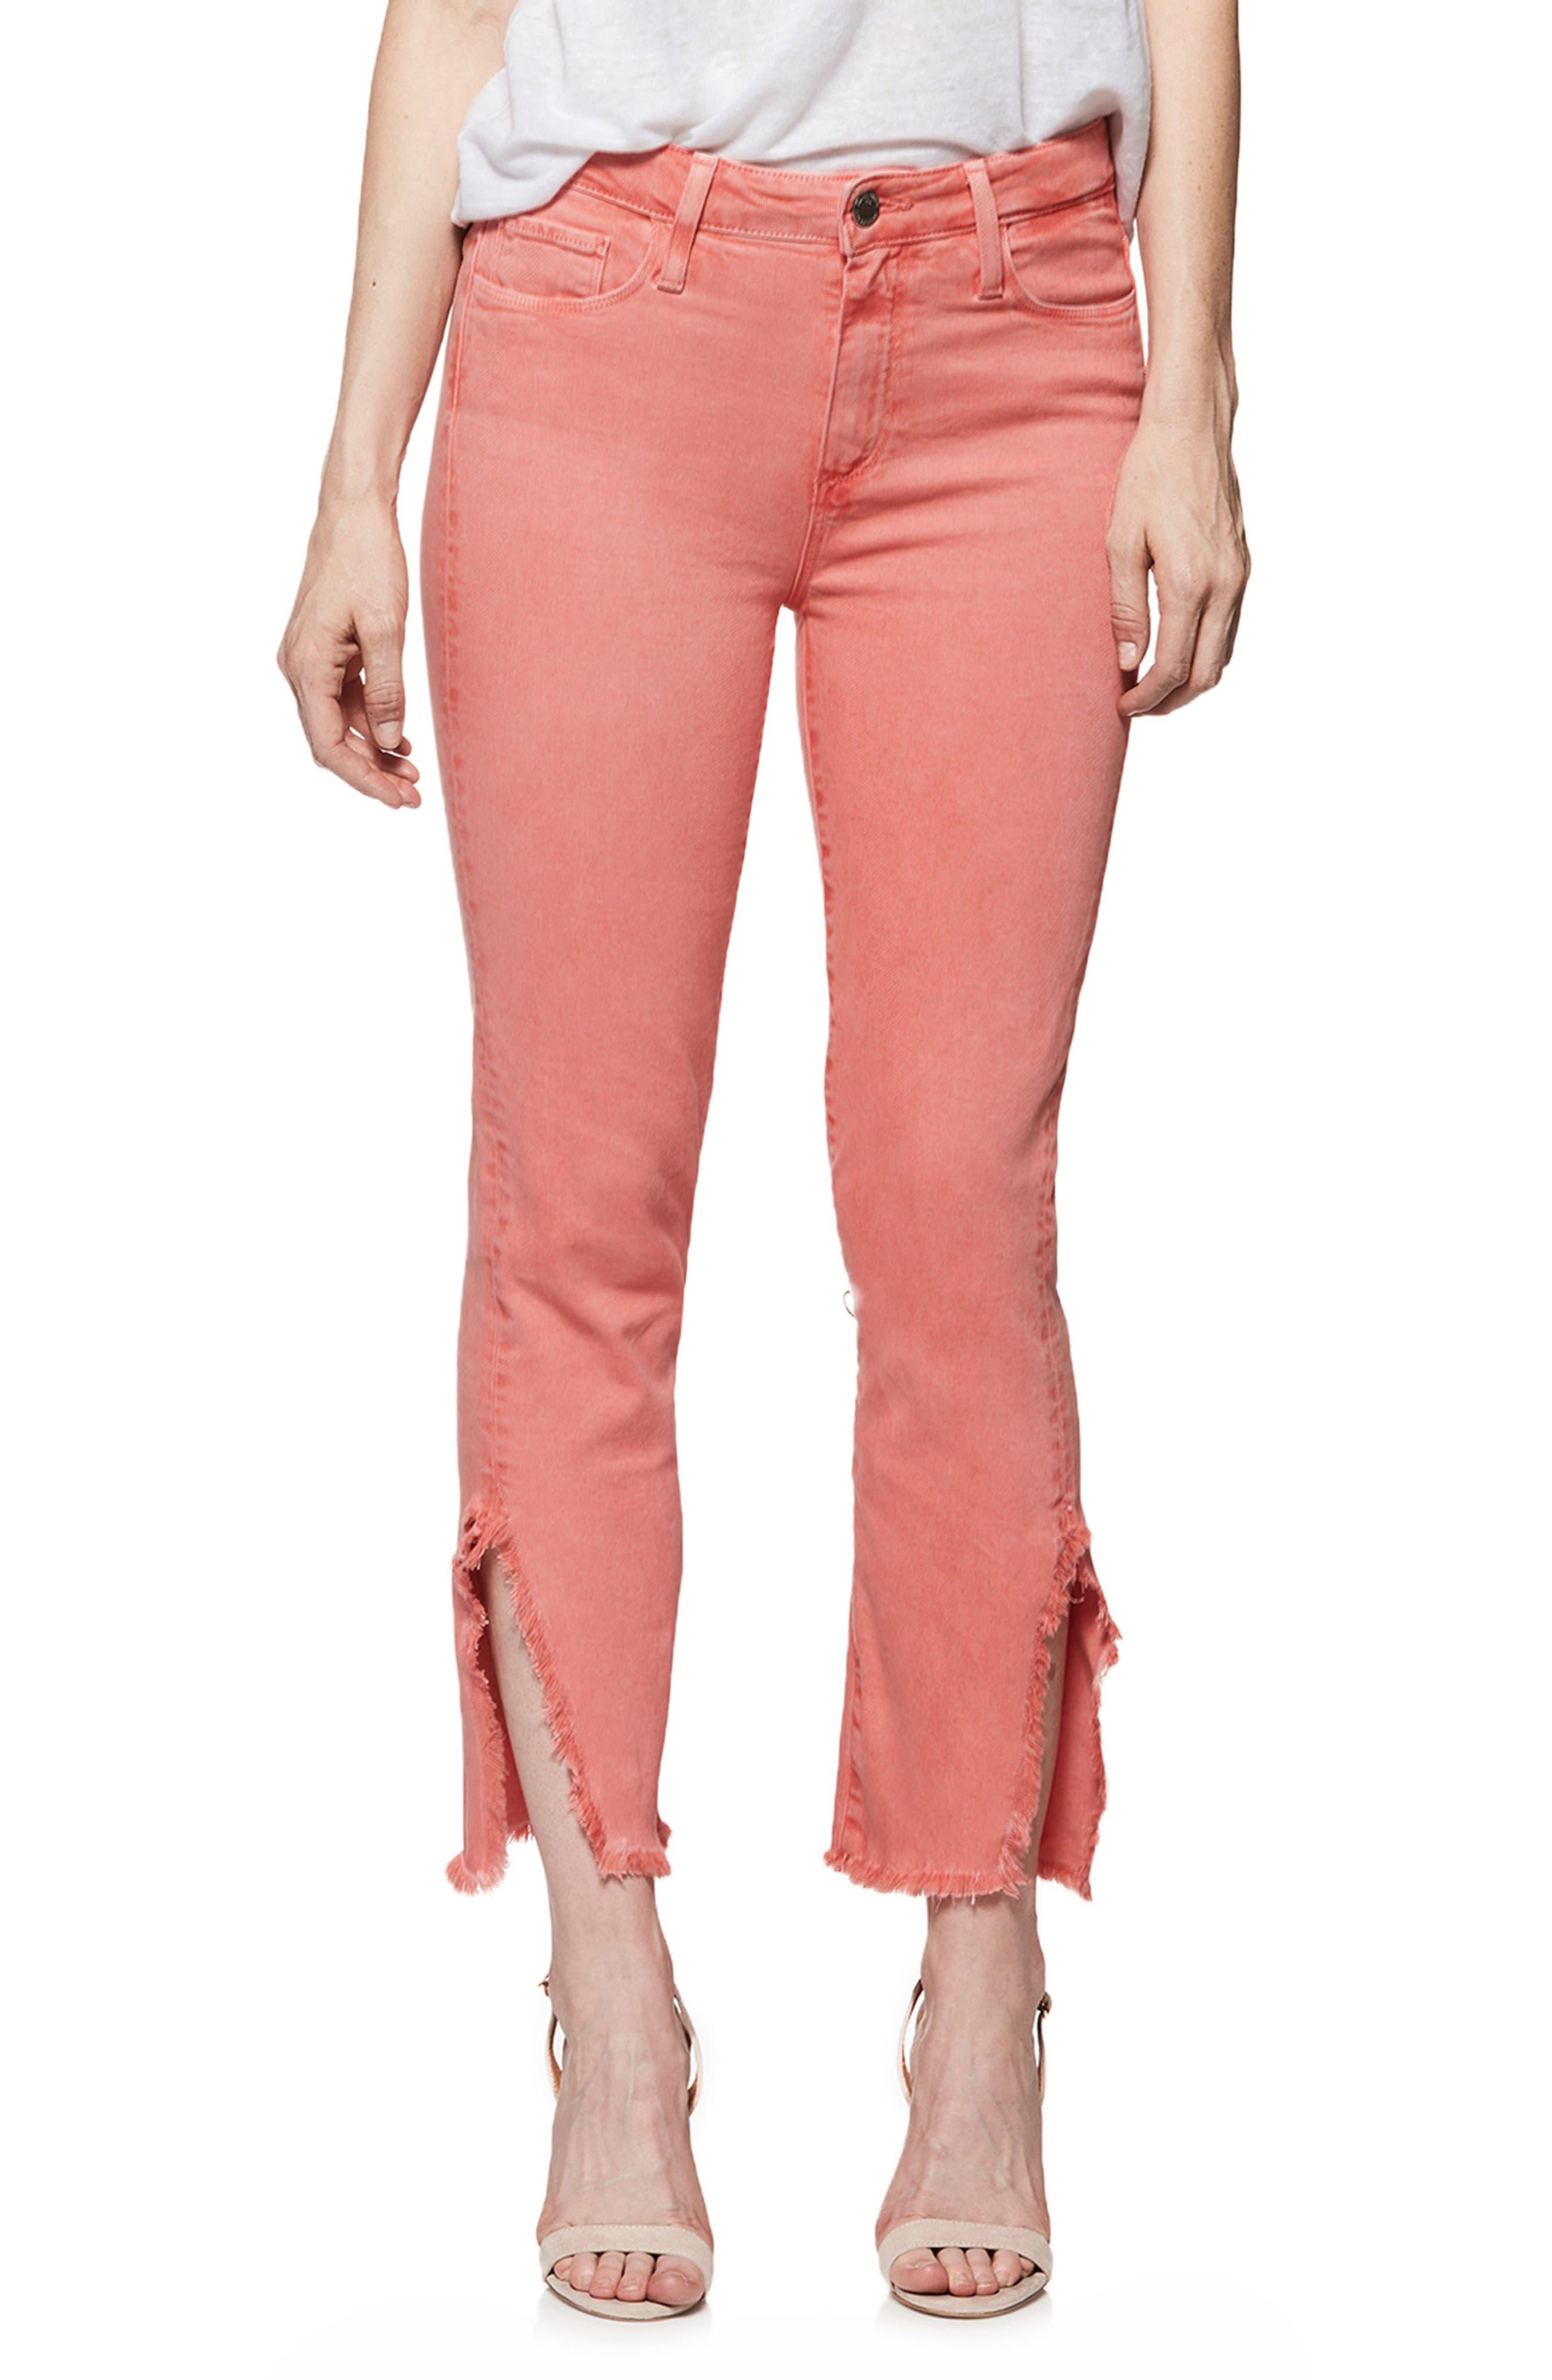 Hoxton High Waist Slit Hem Ankle Straight Jeans,                             Main thumbnail 1, color,                             Vintage Coral Reef